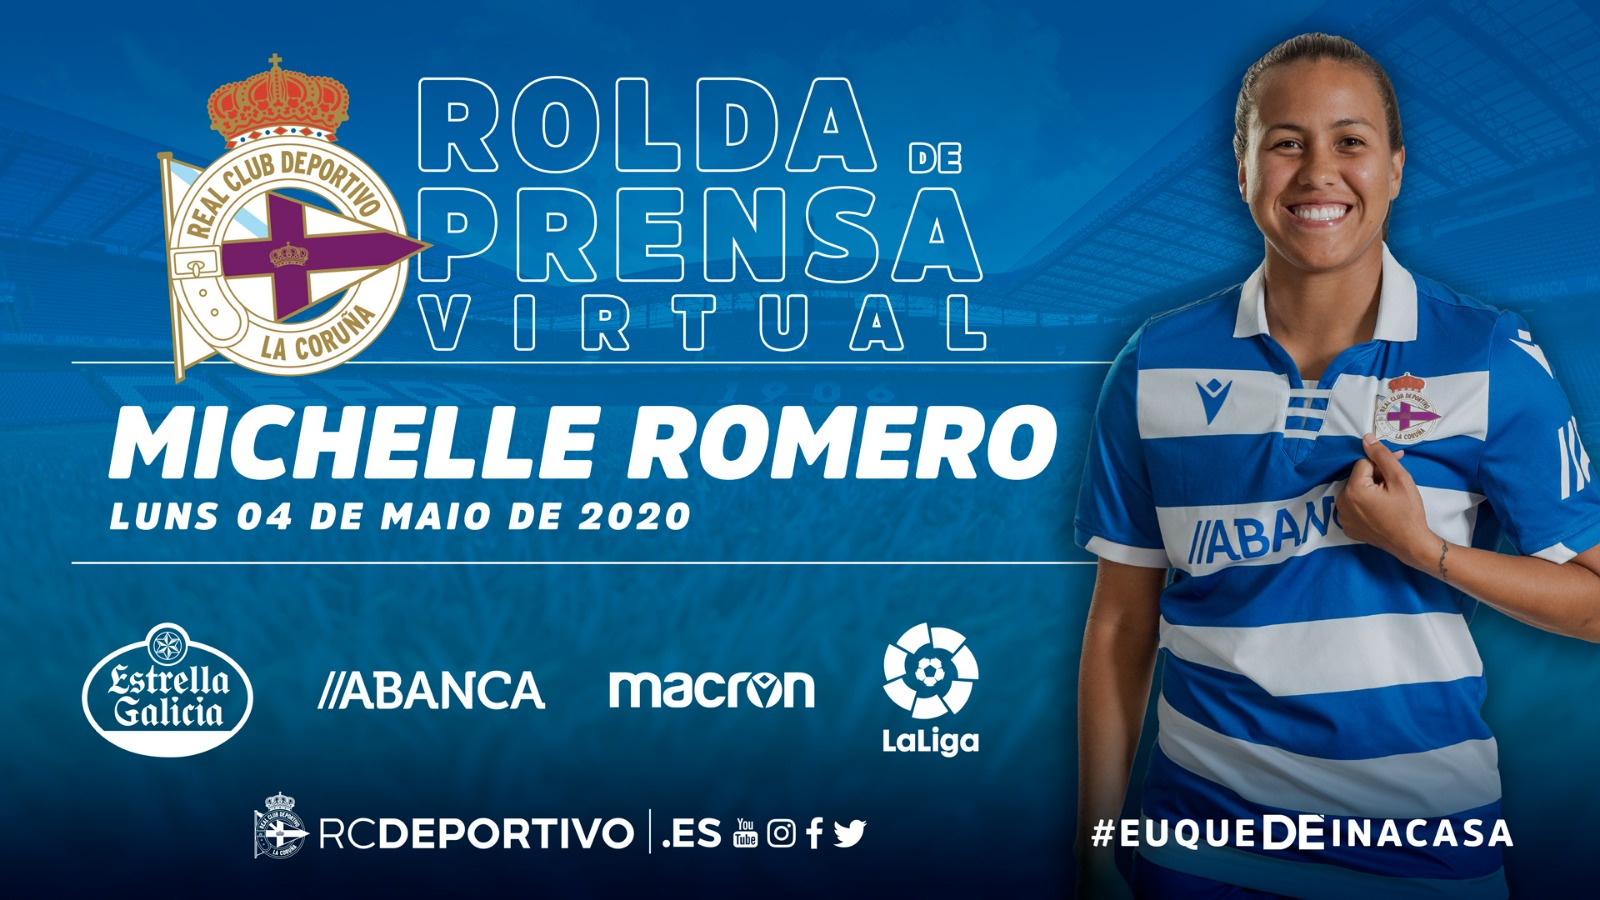 Michelle Romero en rolda de prensa virtual | RCD